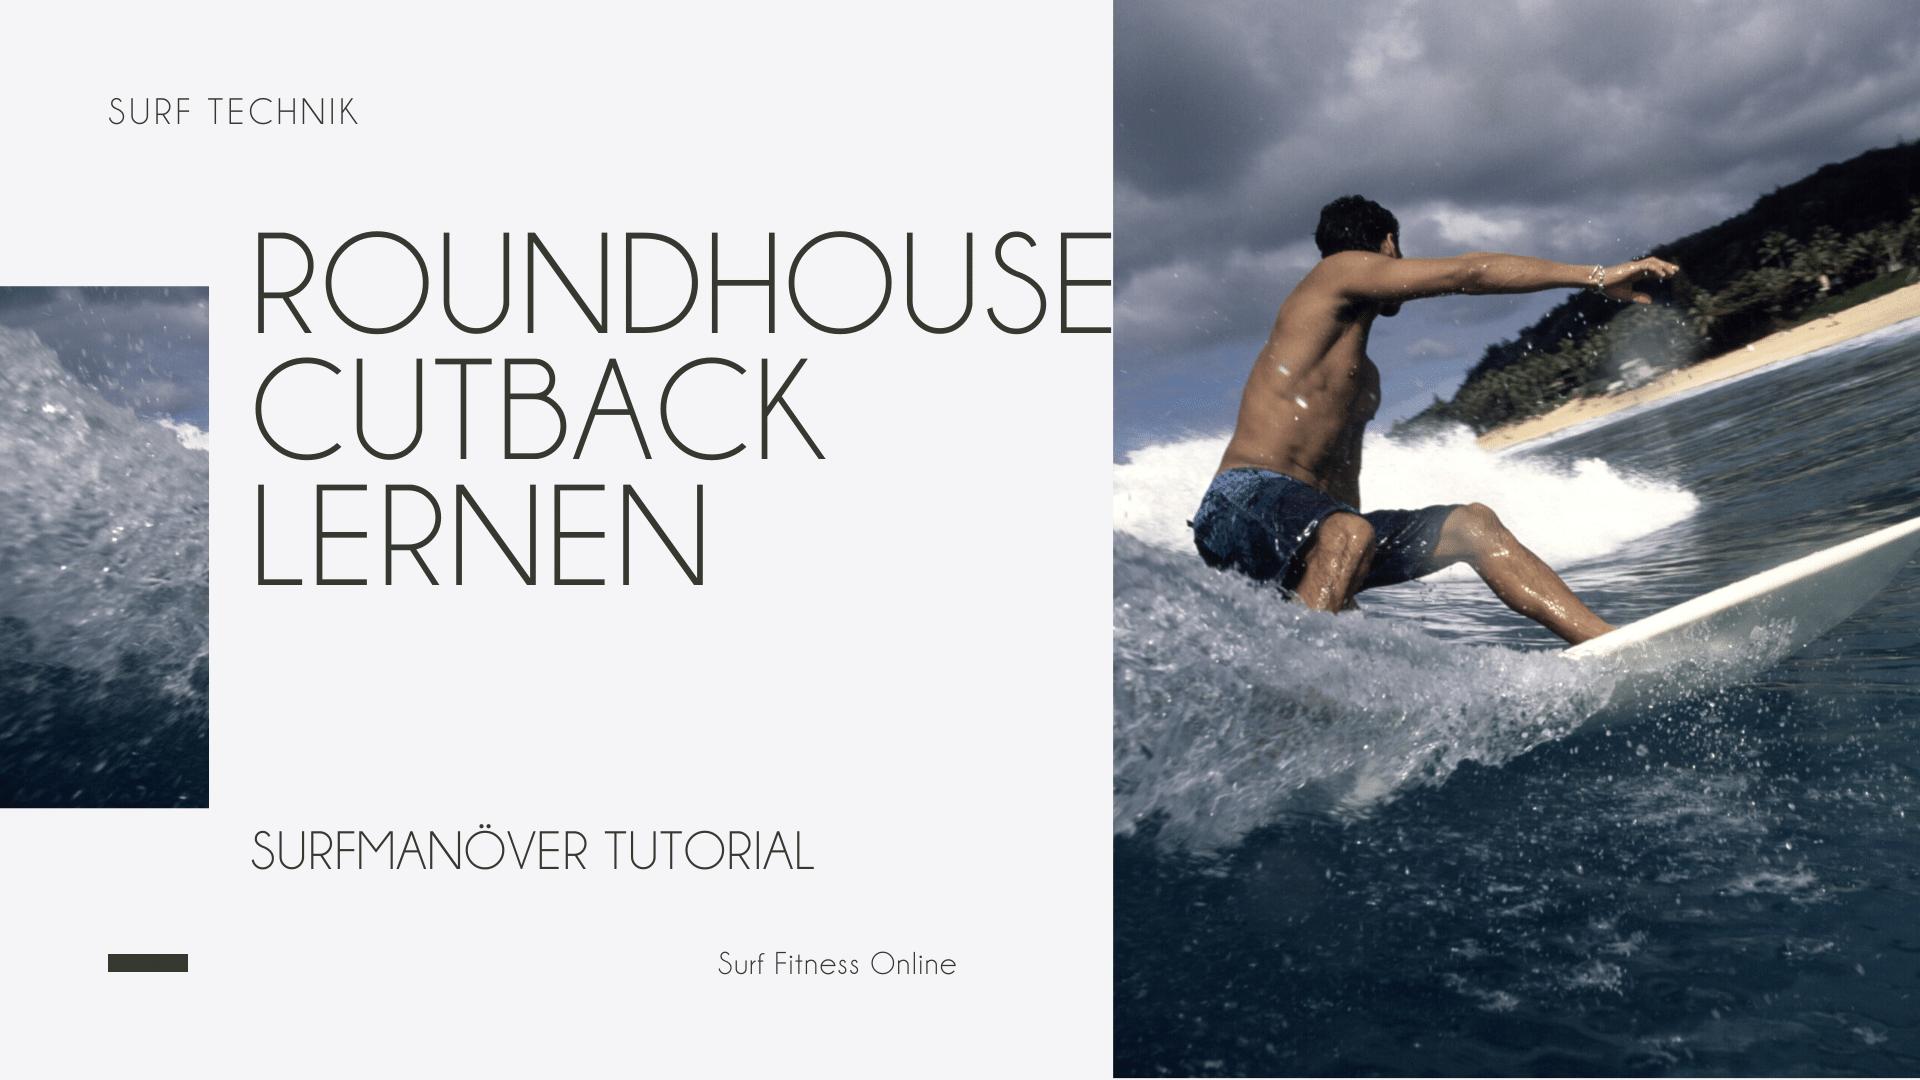 Roundhouse Cutback Surfmanöver